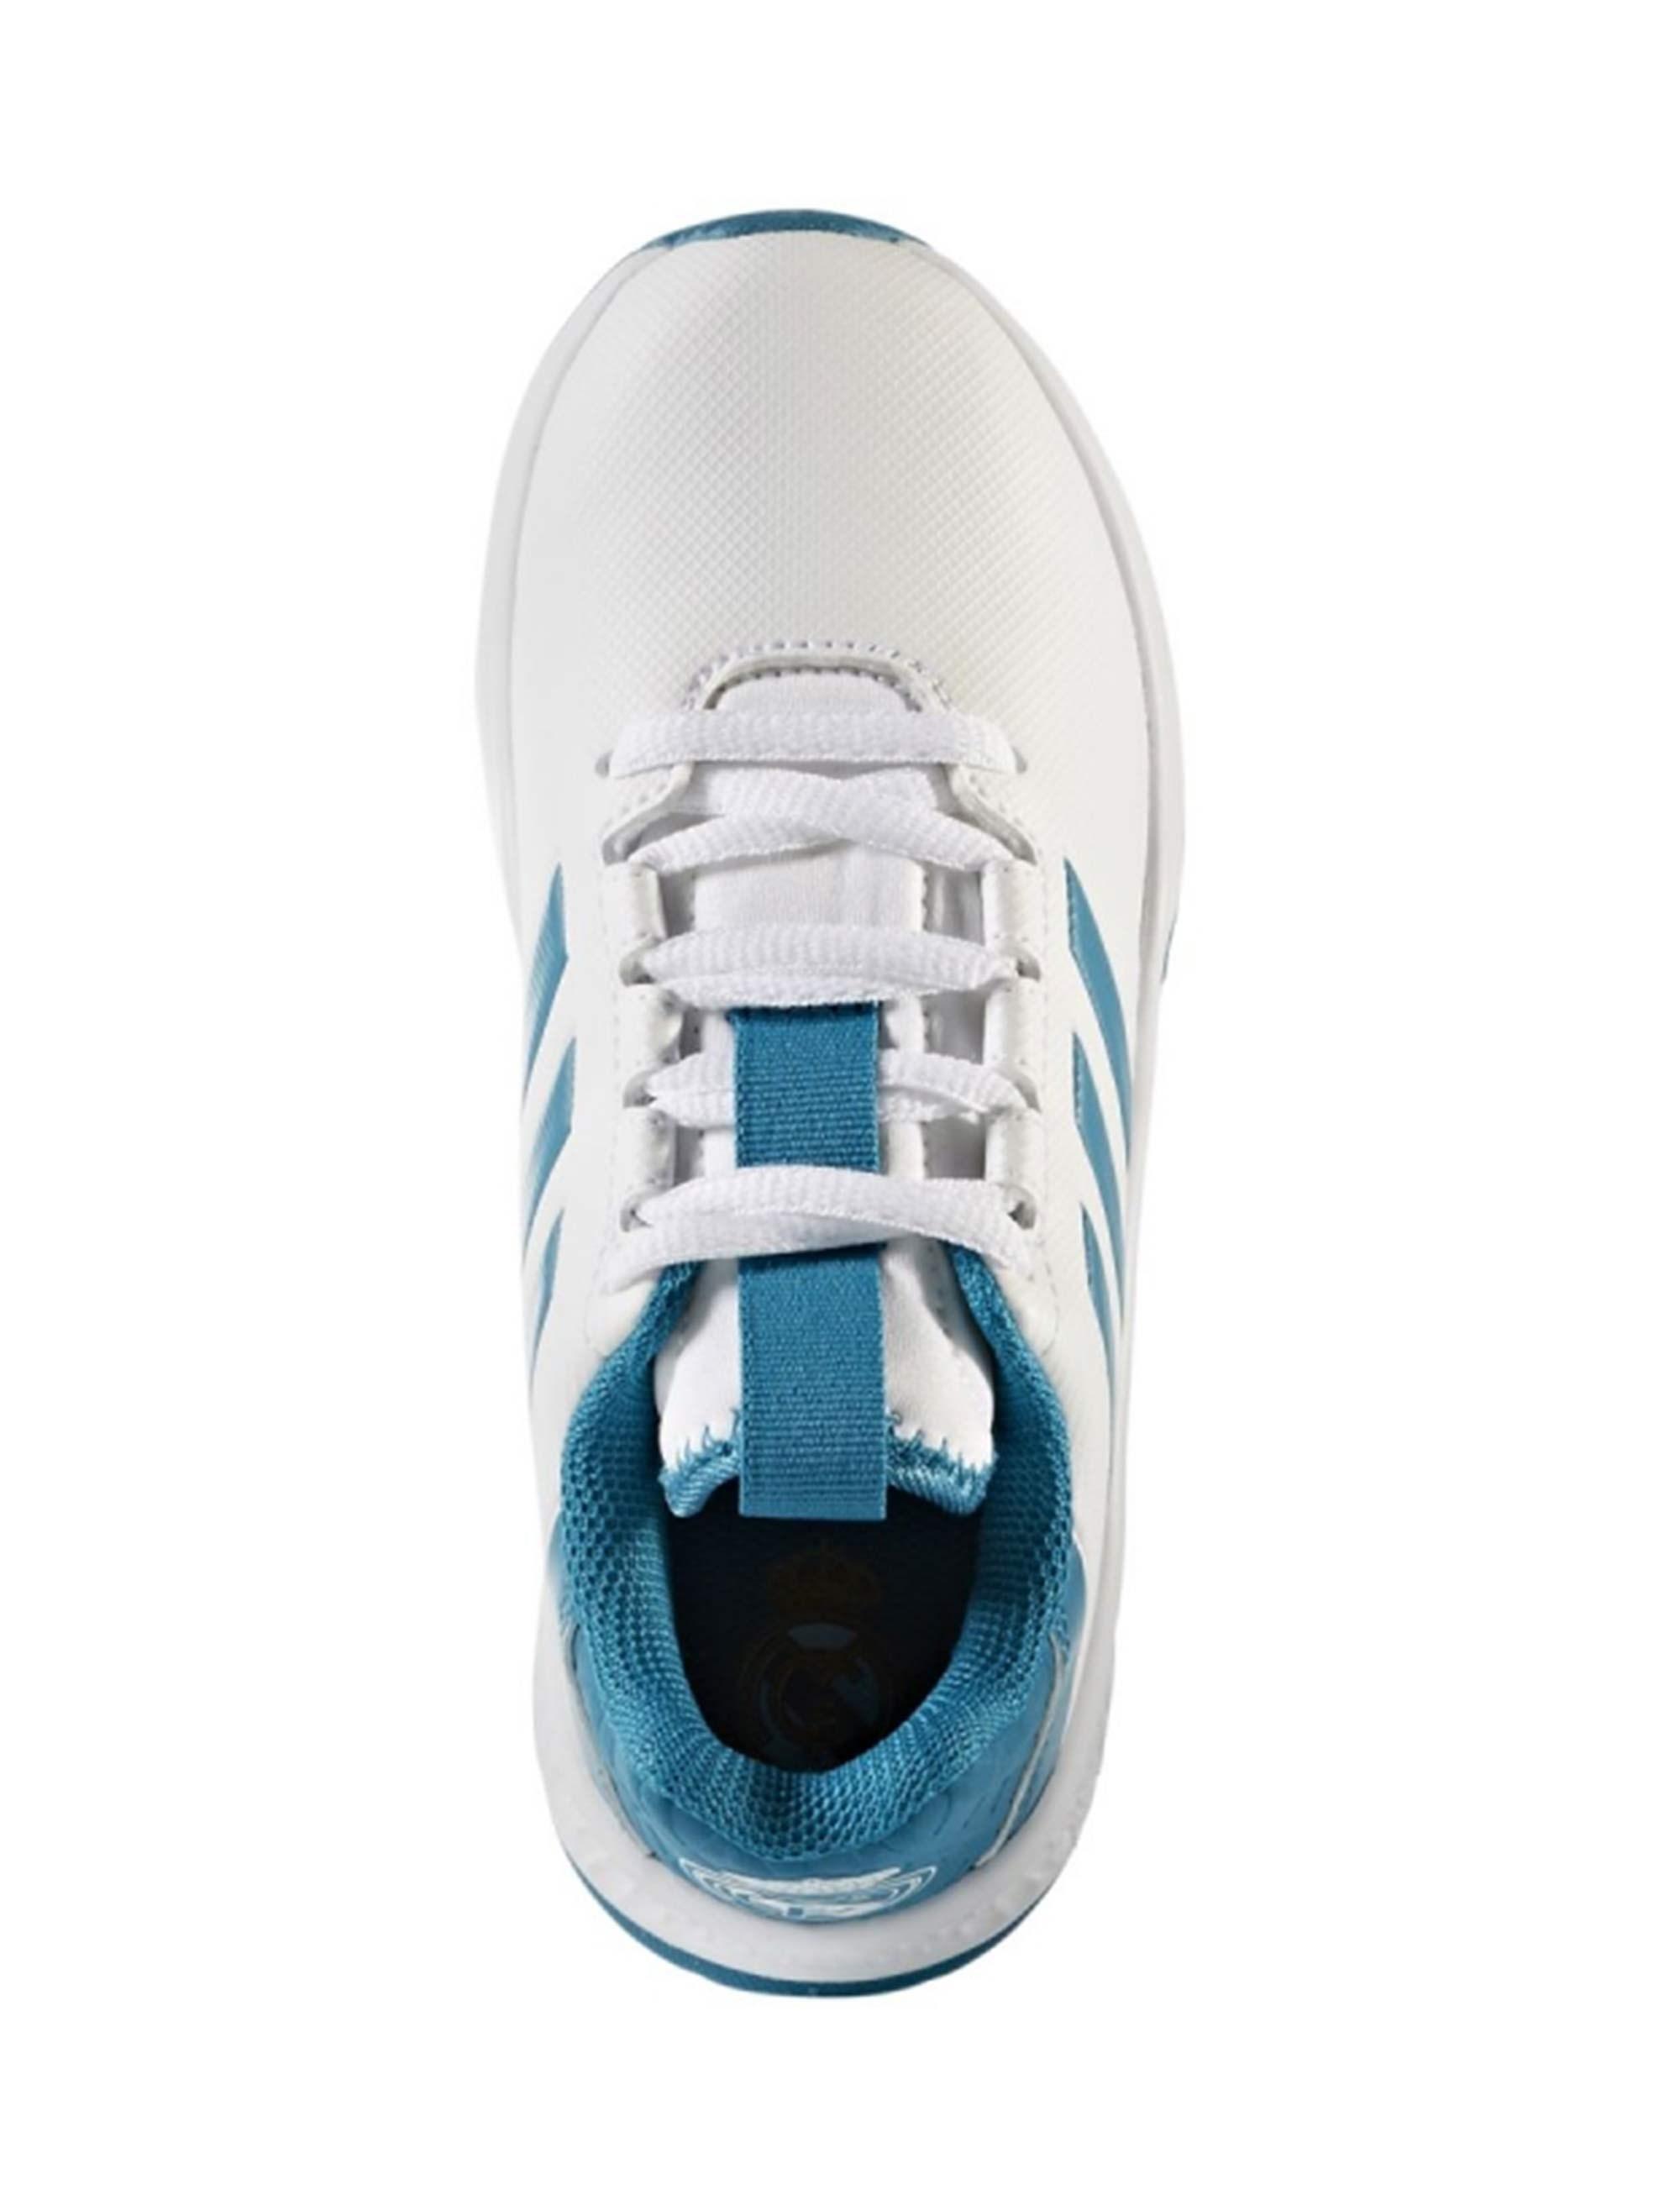 کفش فوتبال بندی پسرانه RapidaTurf Real Madrid - آدیداس - سفيد - 3